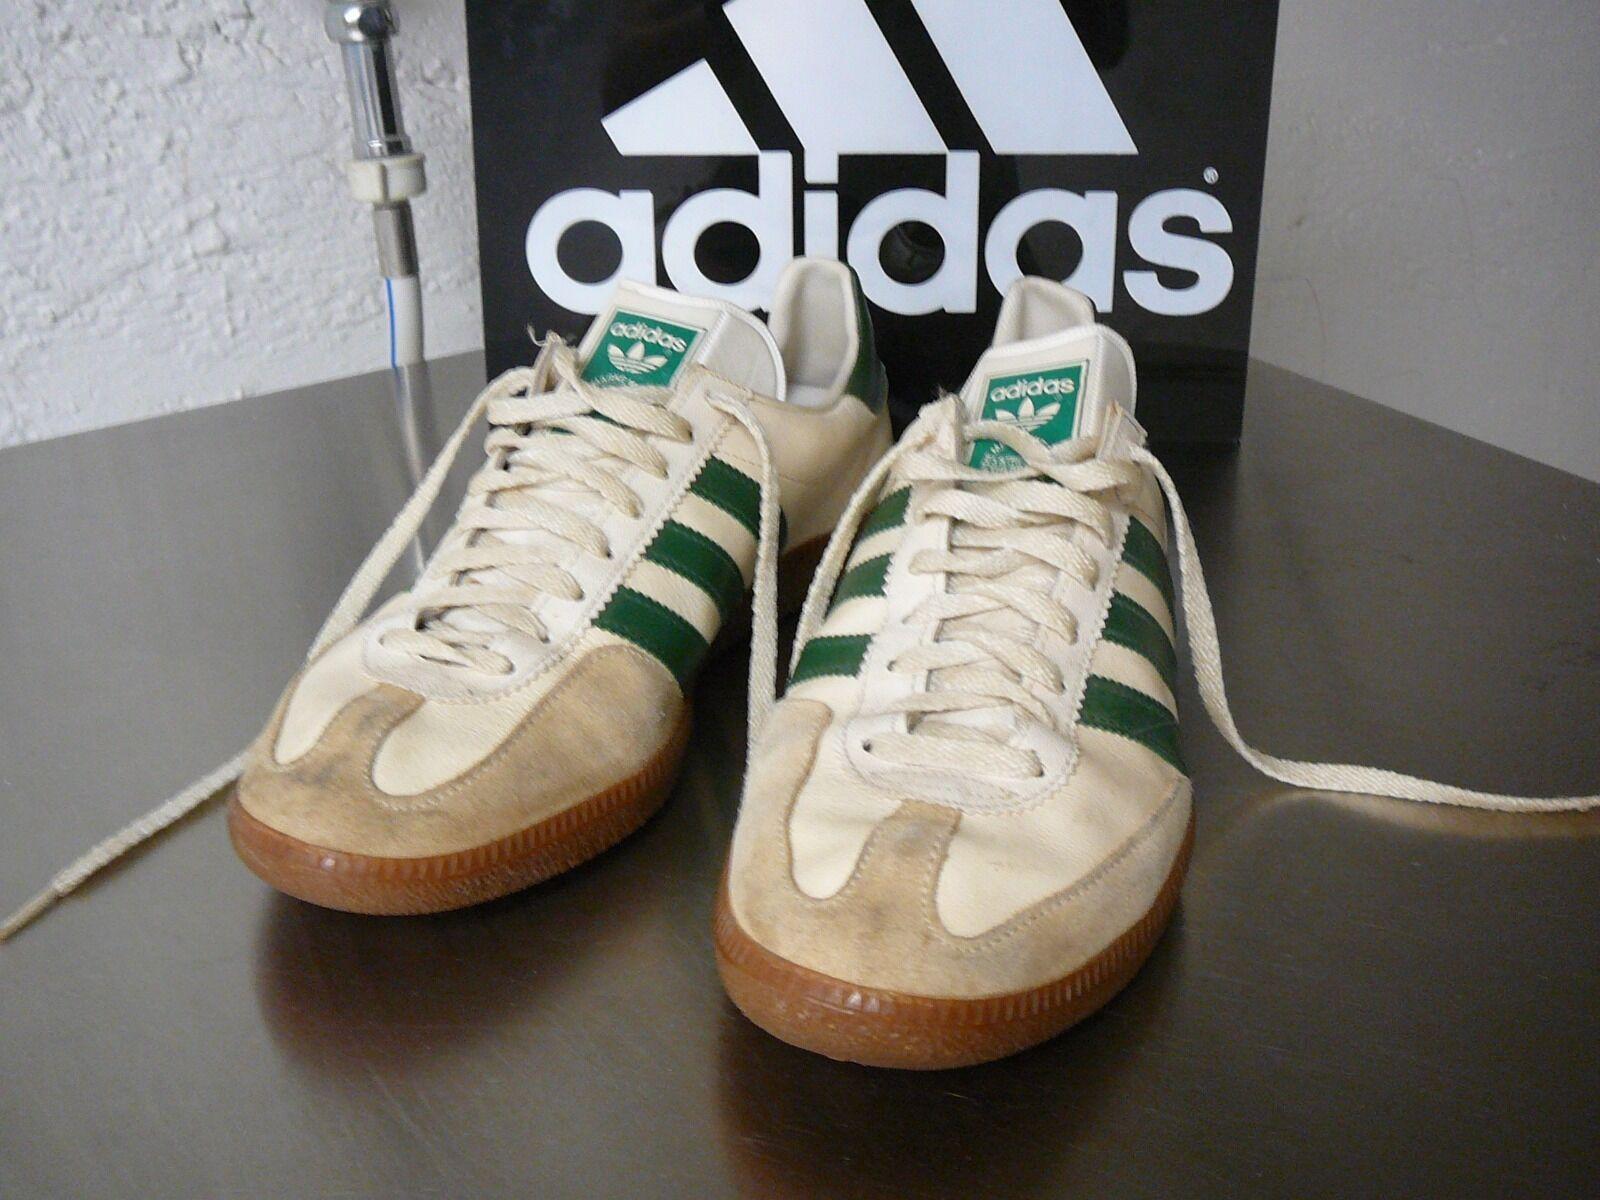 Adidas universal spezial UK 9.5  70iger